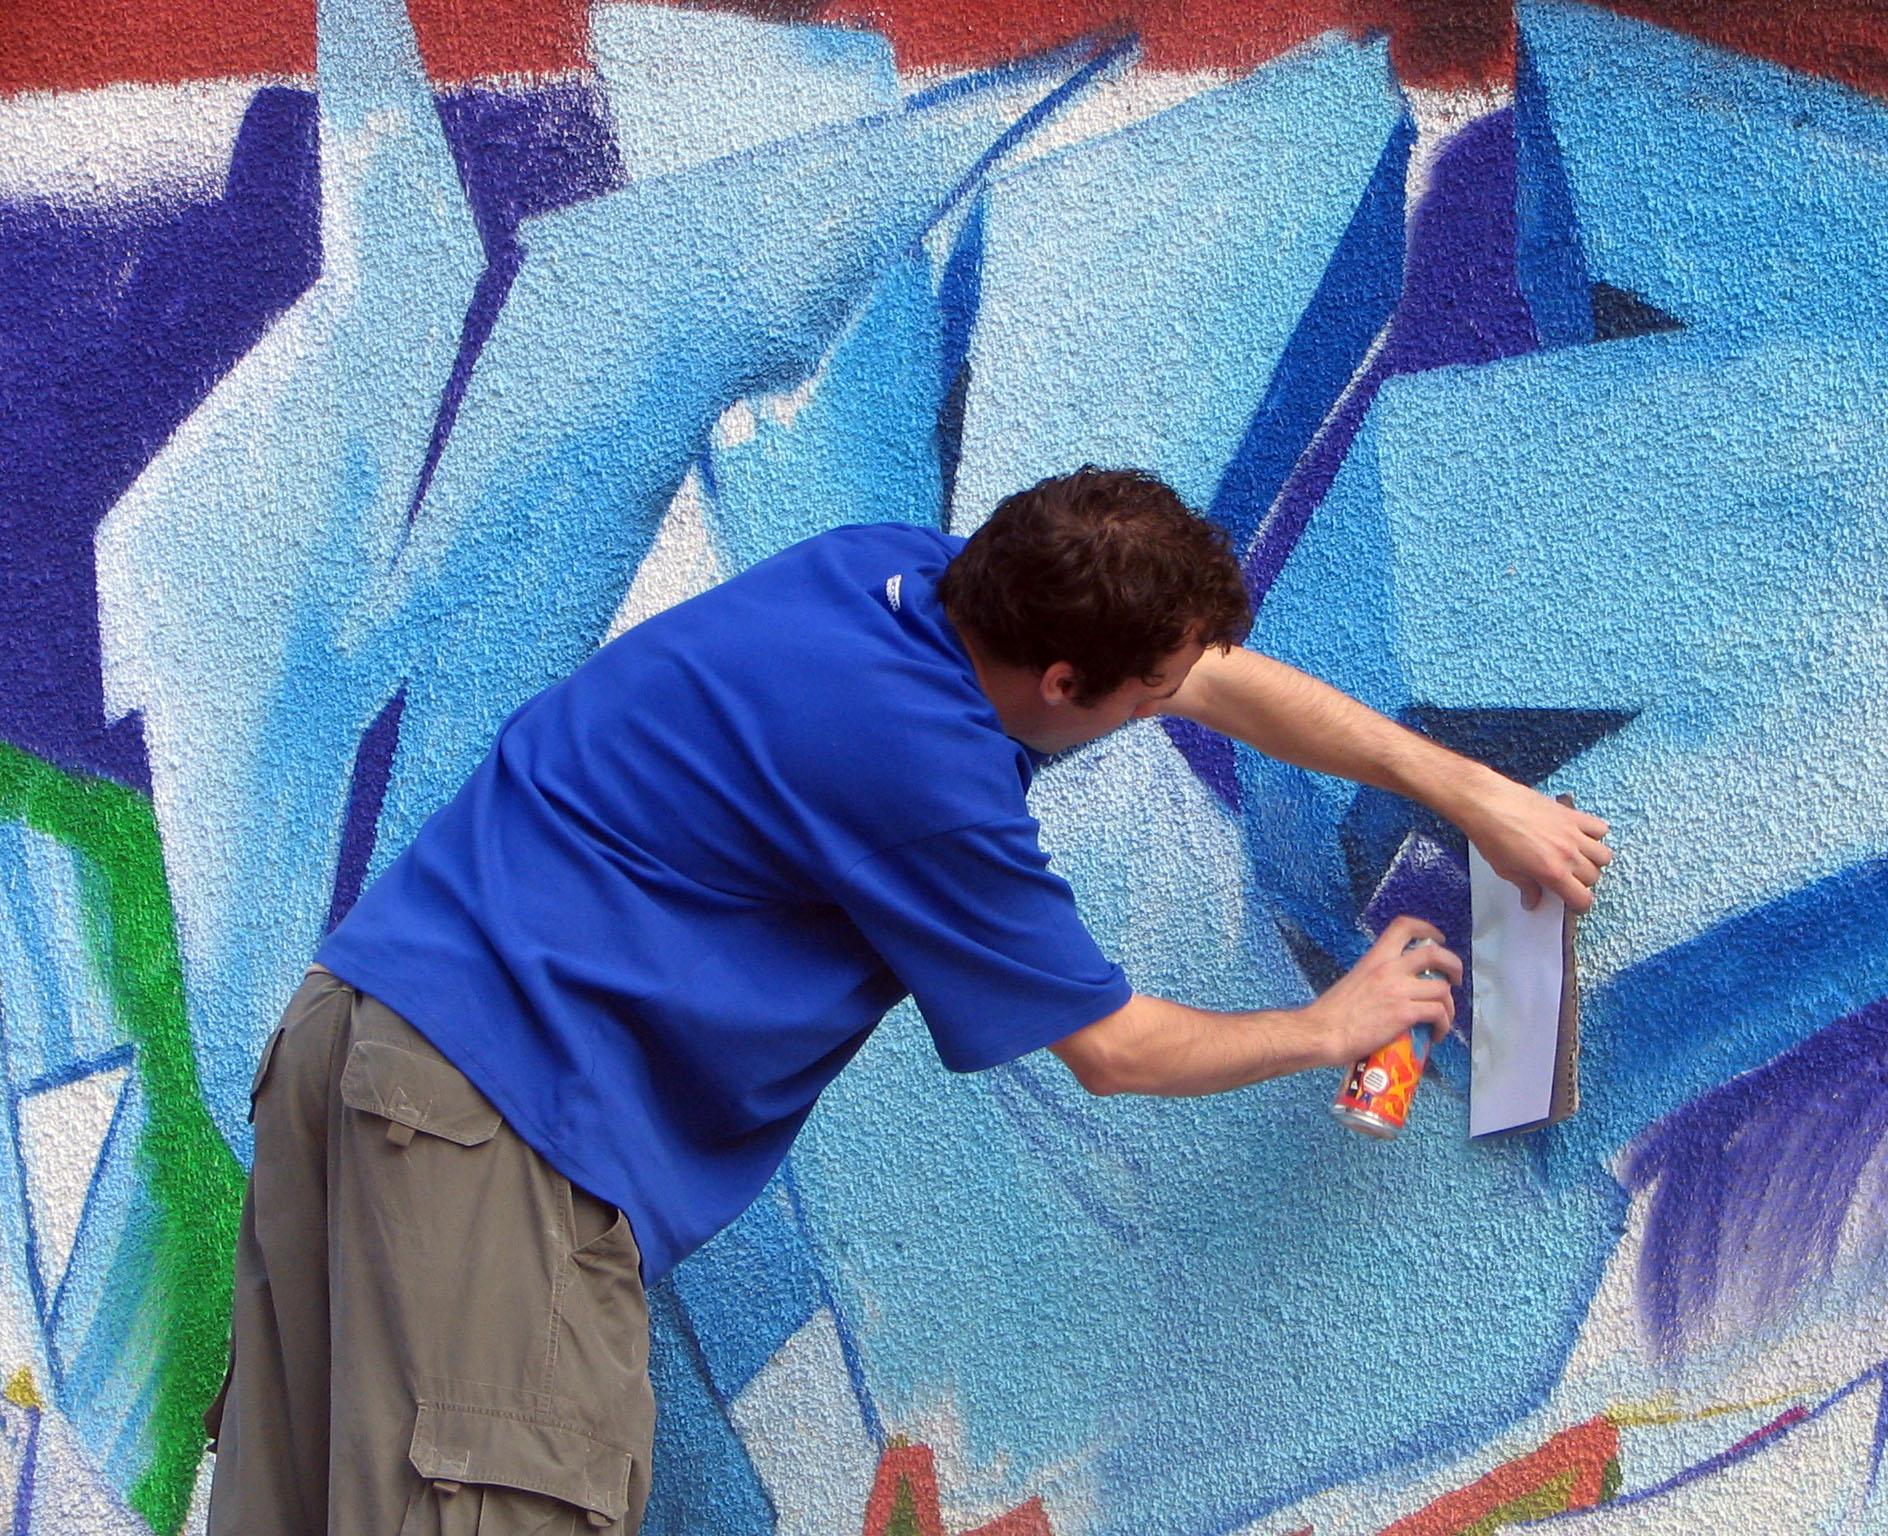 Fenomenul graffiti ia amploare la Targu Mures. Doi tineri au fost amendati de politisti